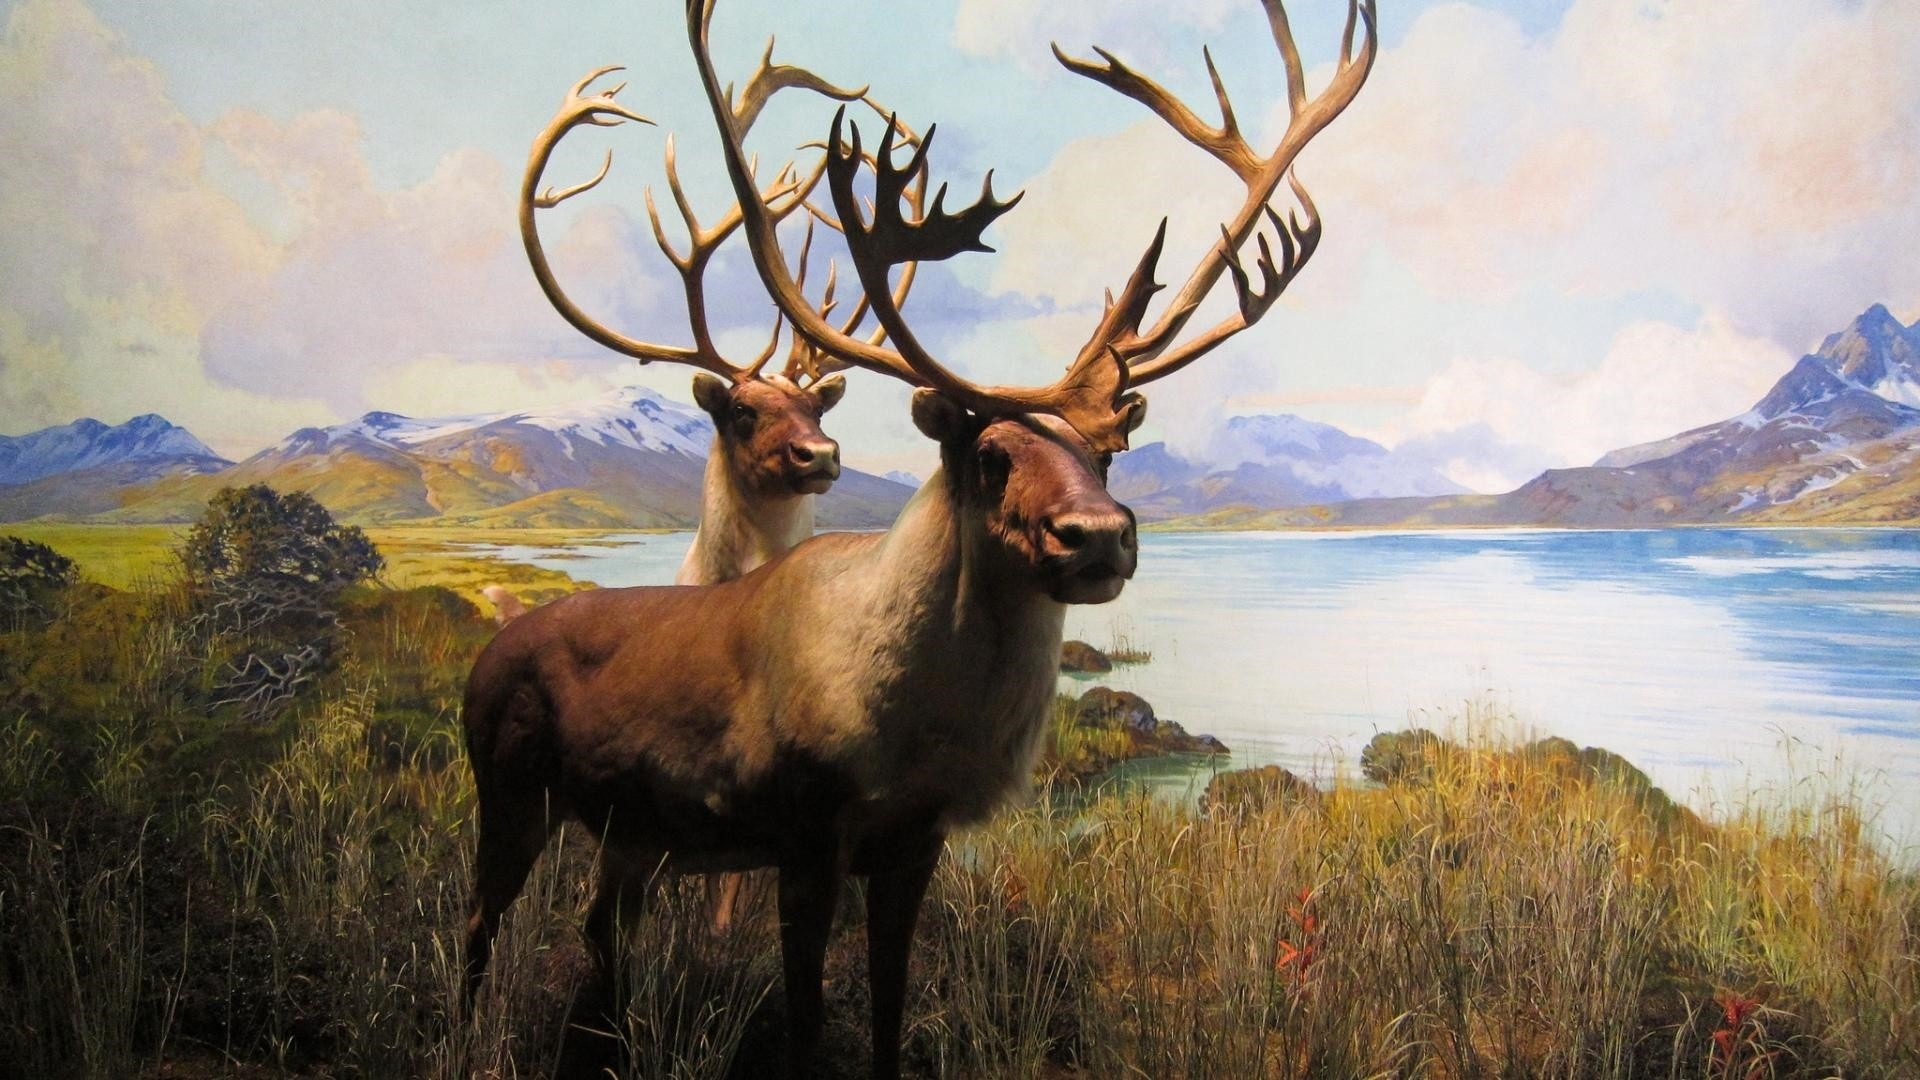 Elk Wallpaper image hd